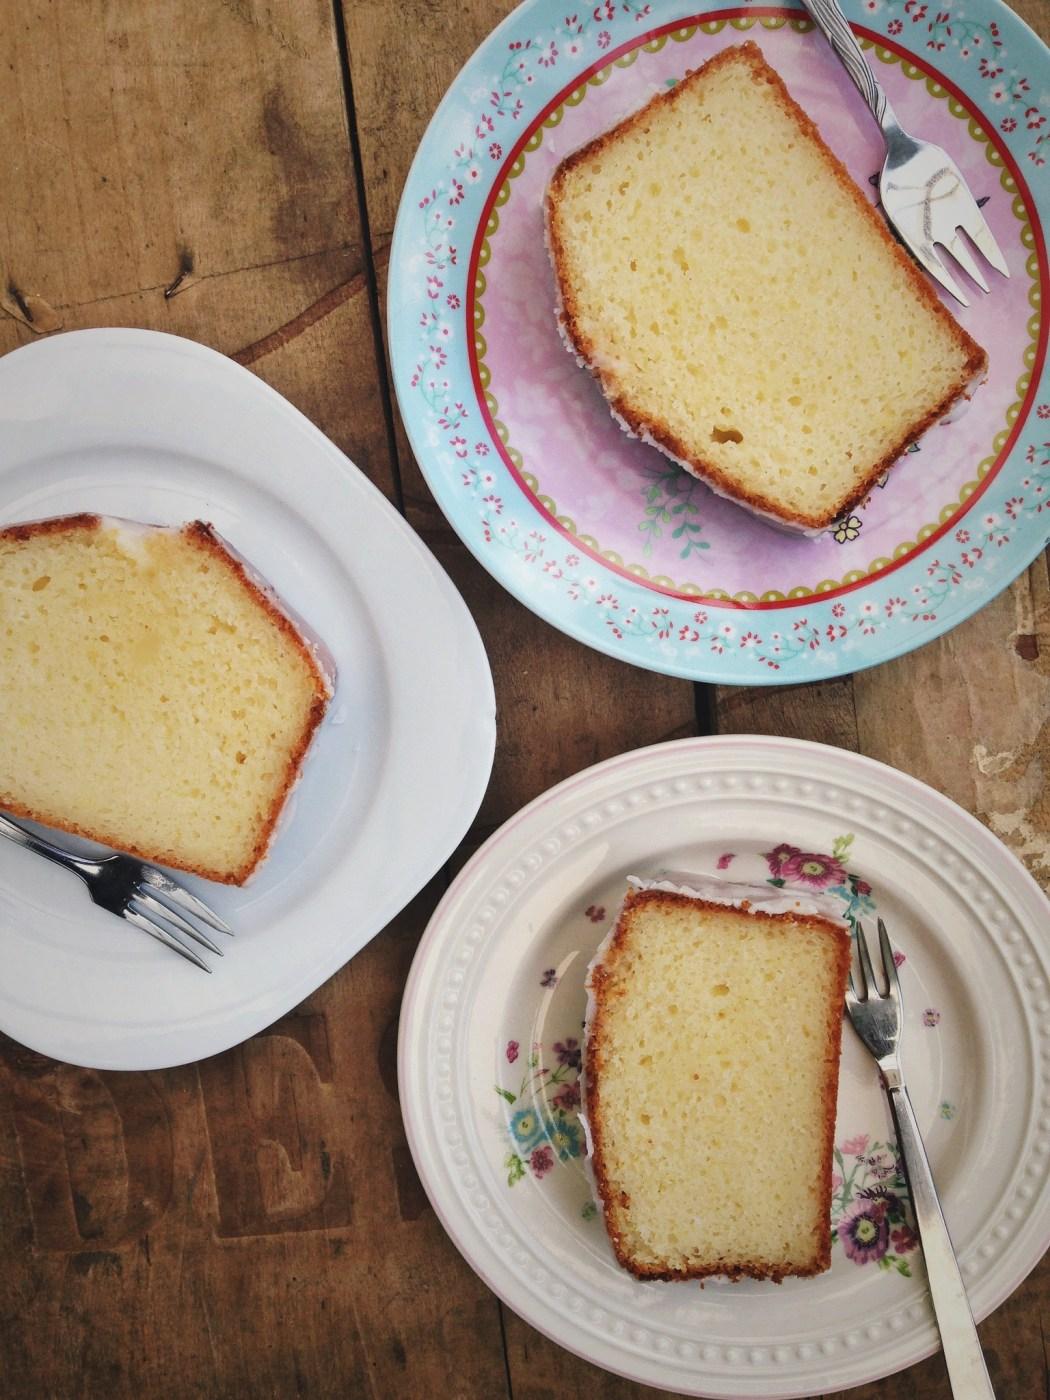 Griekse yoghurt cake met citroen